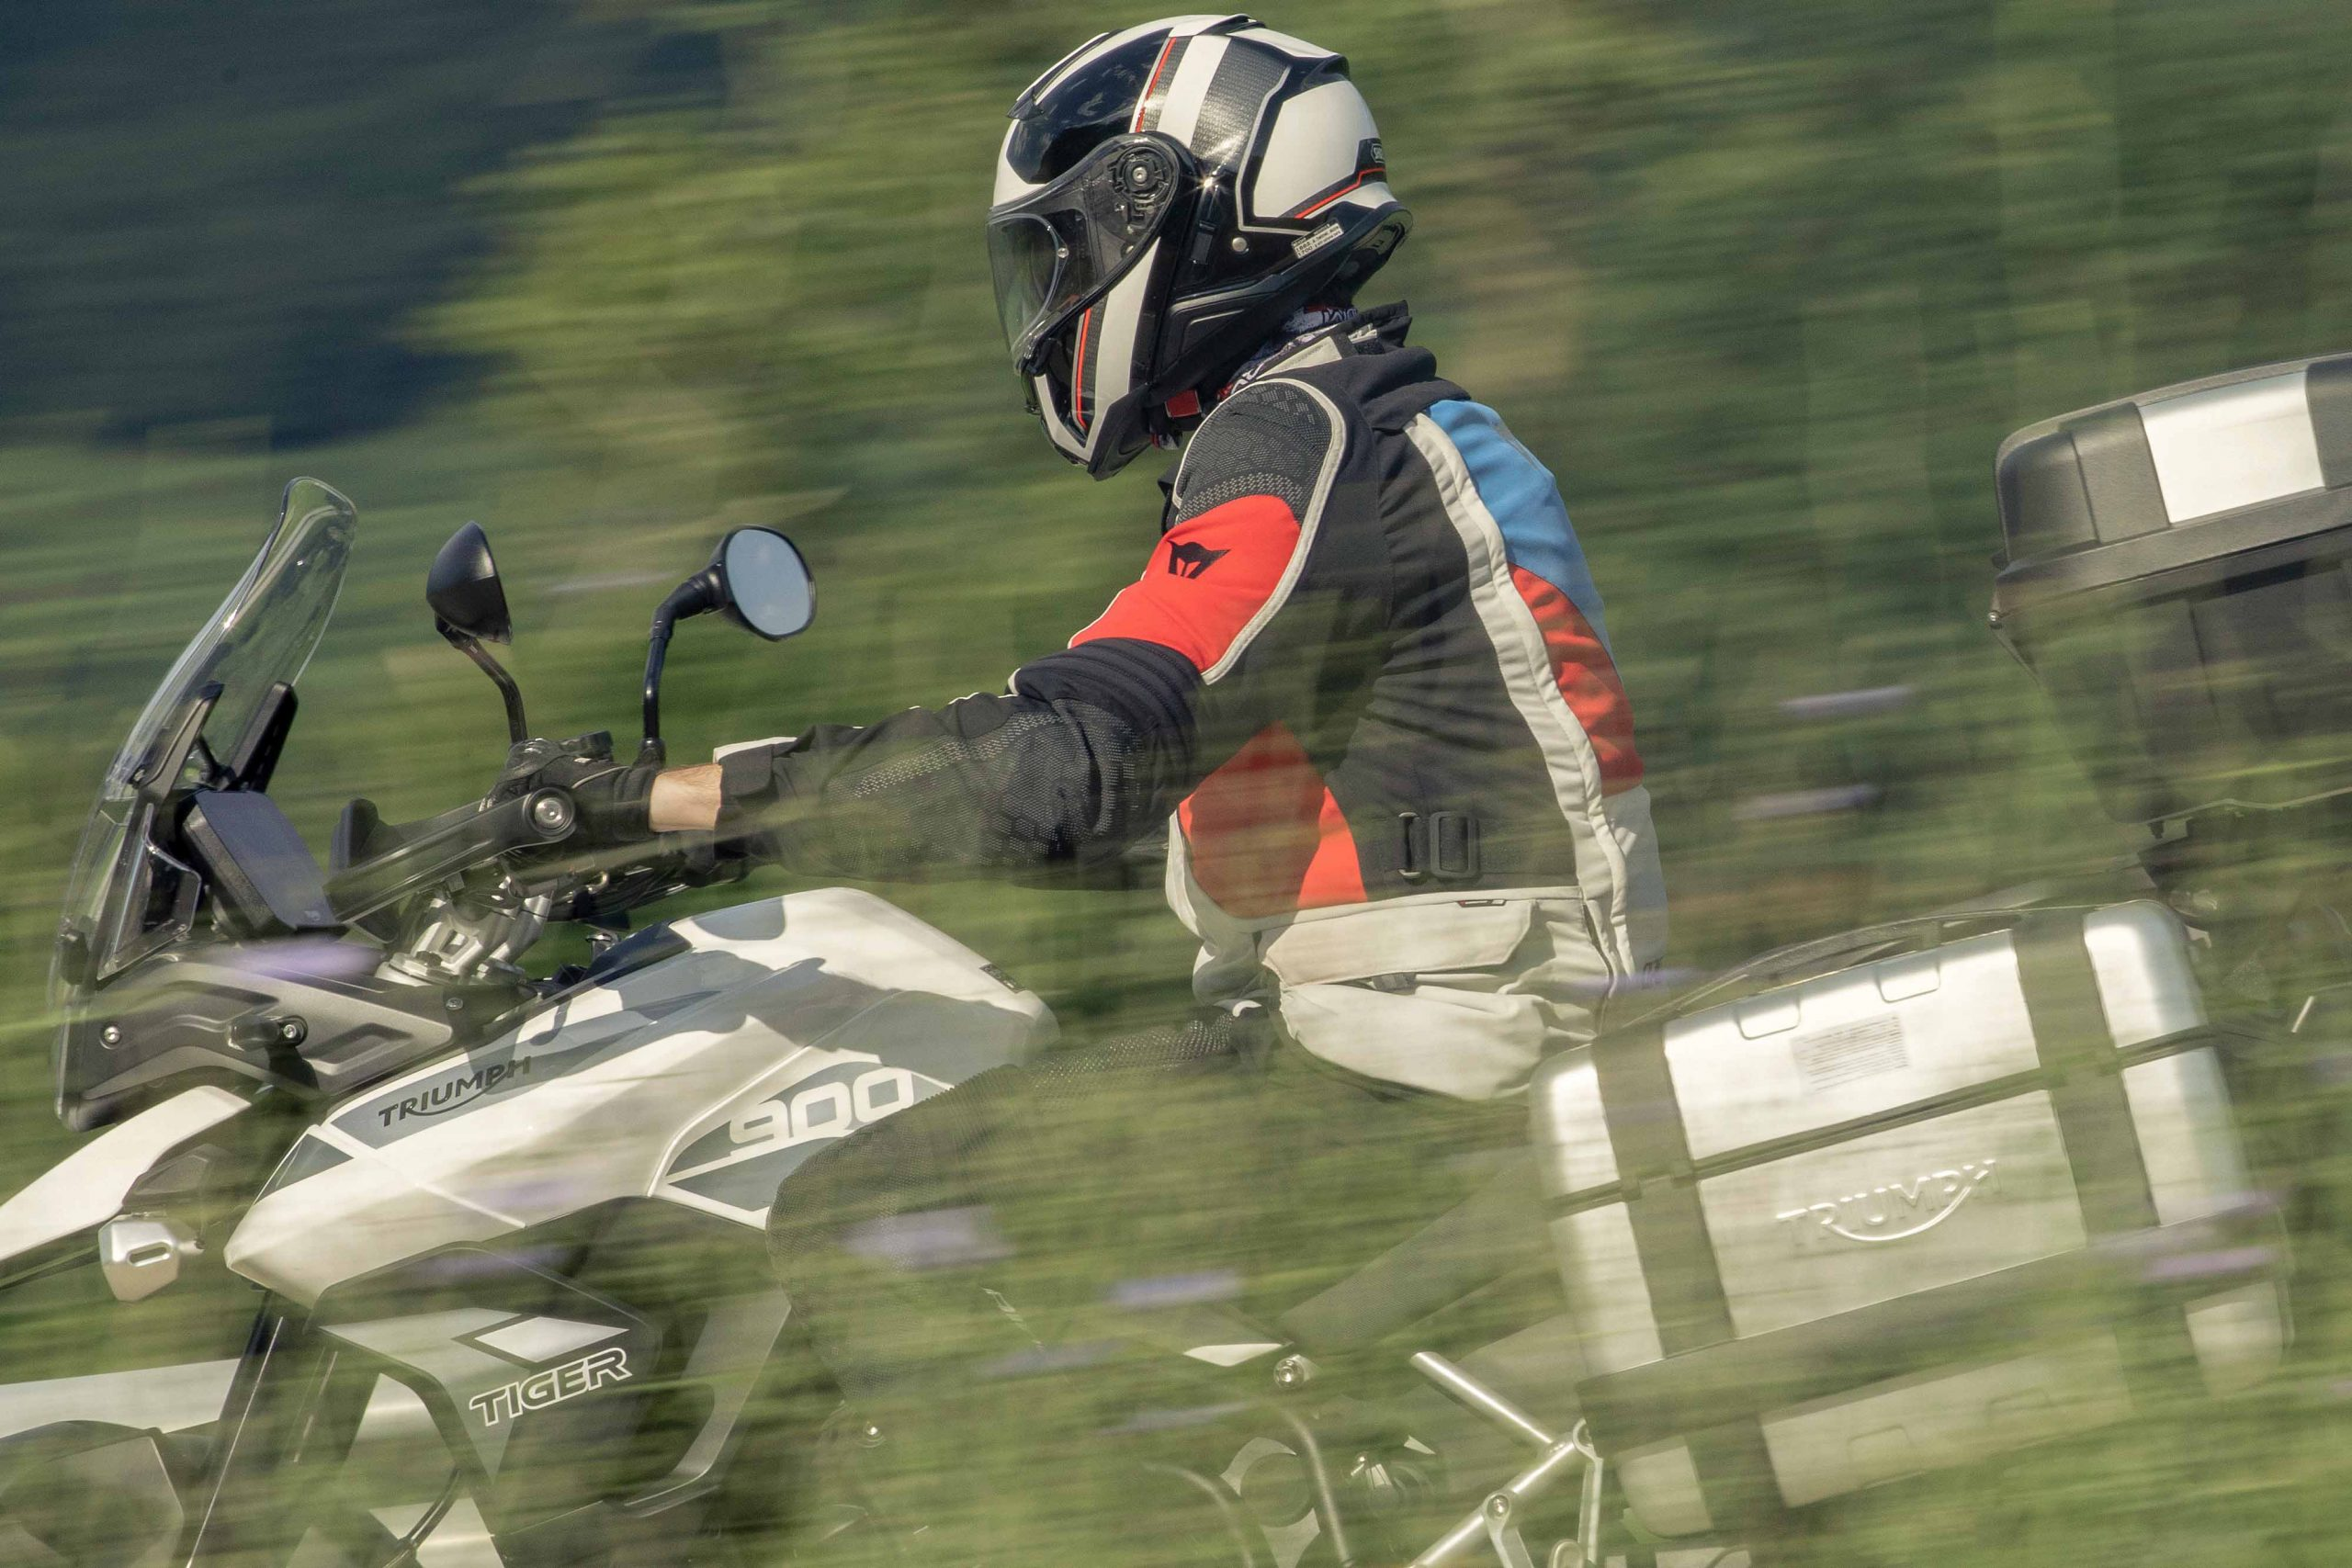 005_TriumphTiger-motosnet-mariapujol-fotografobarcelona